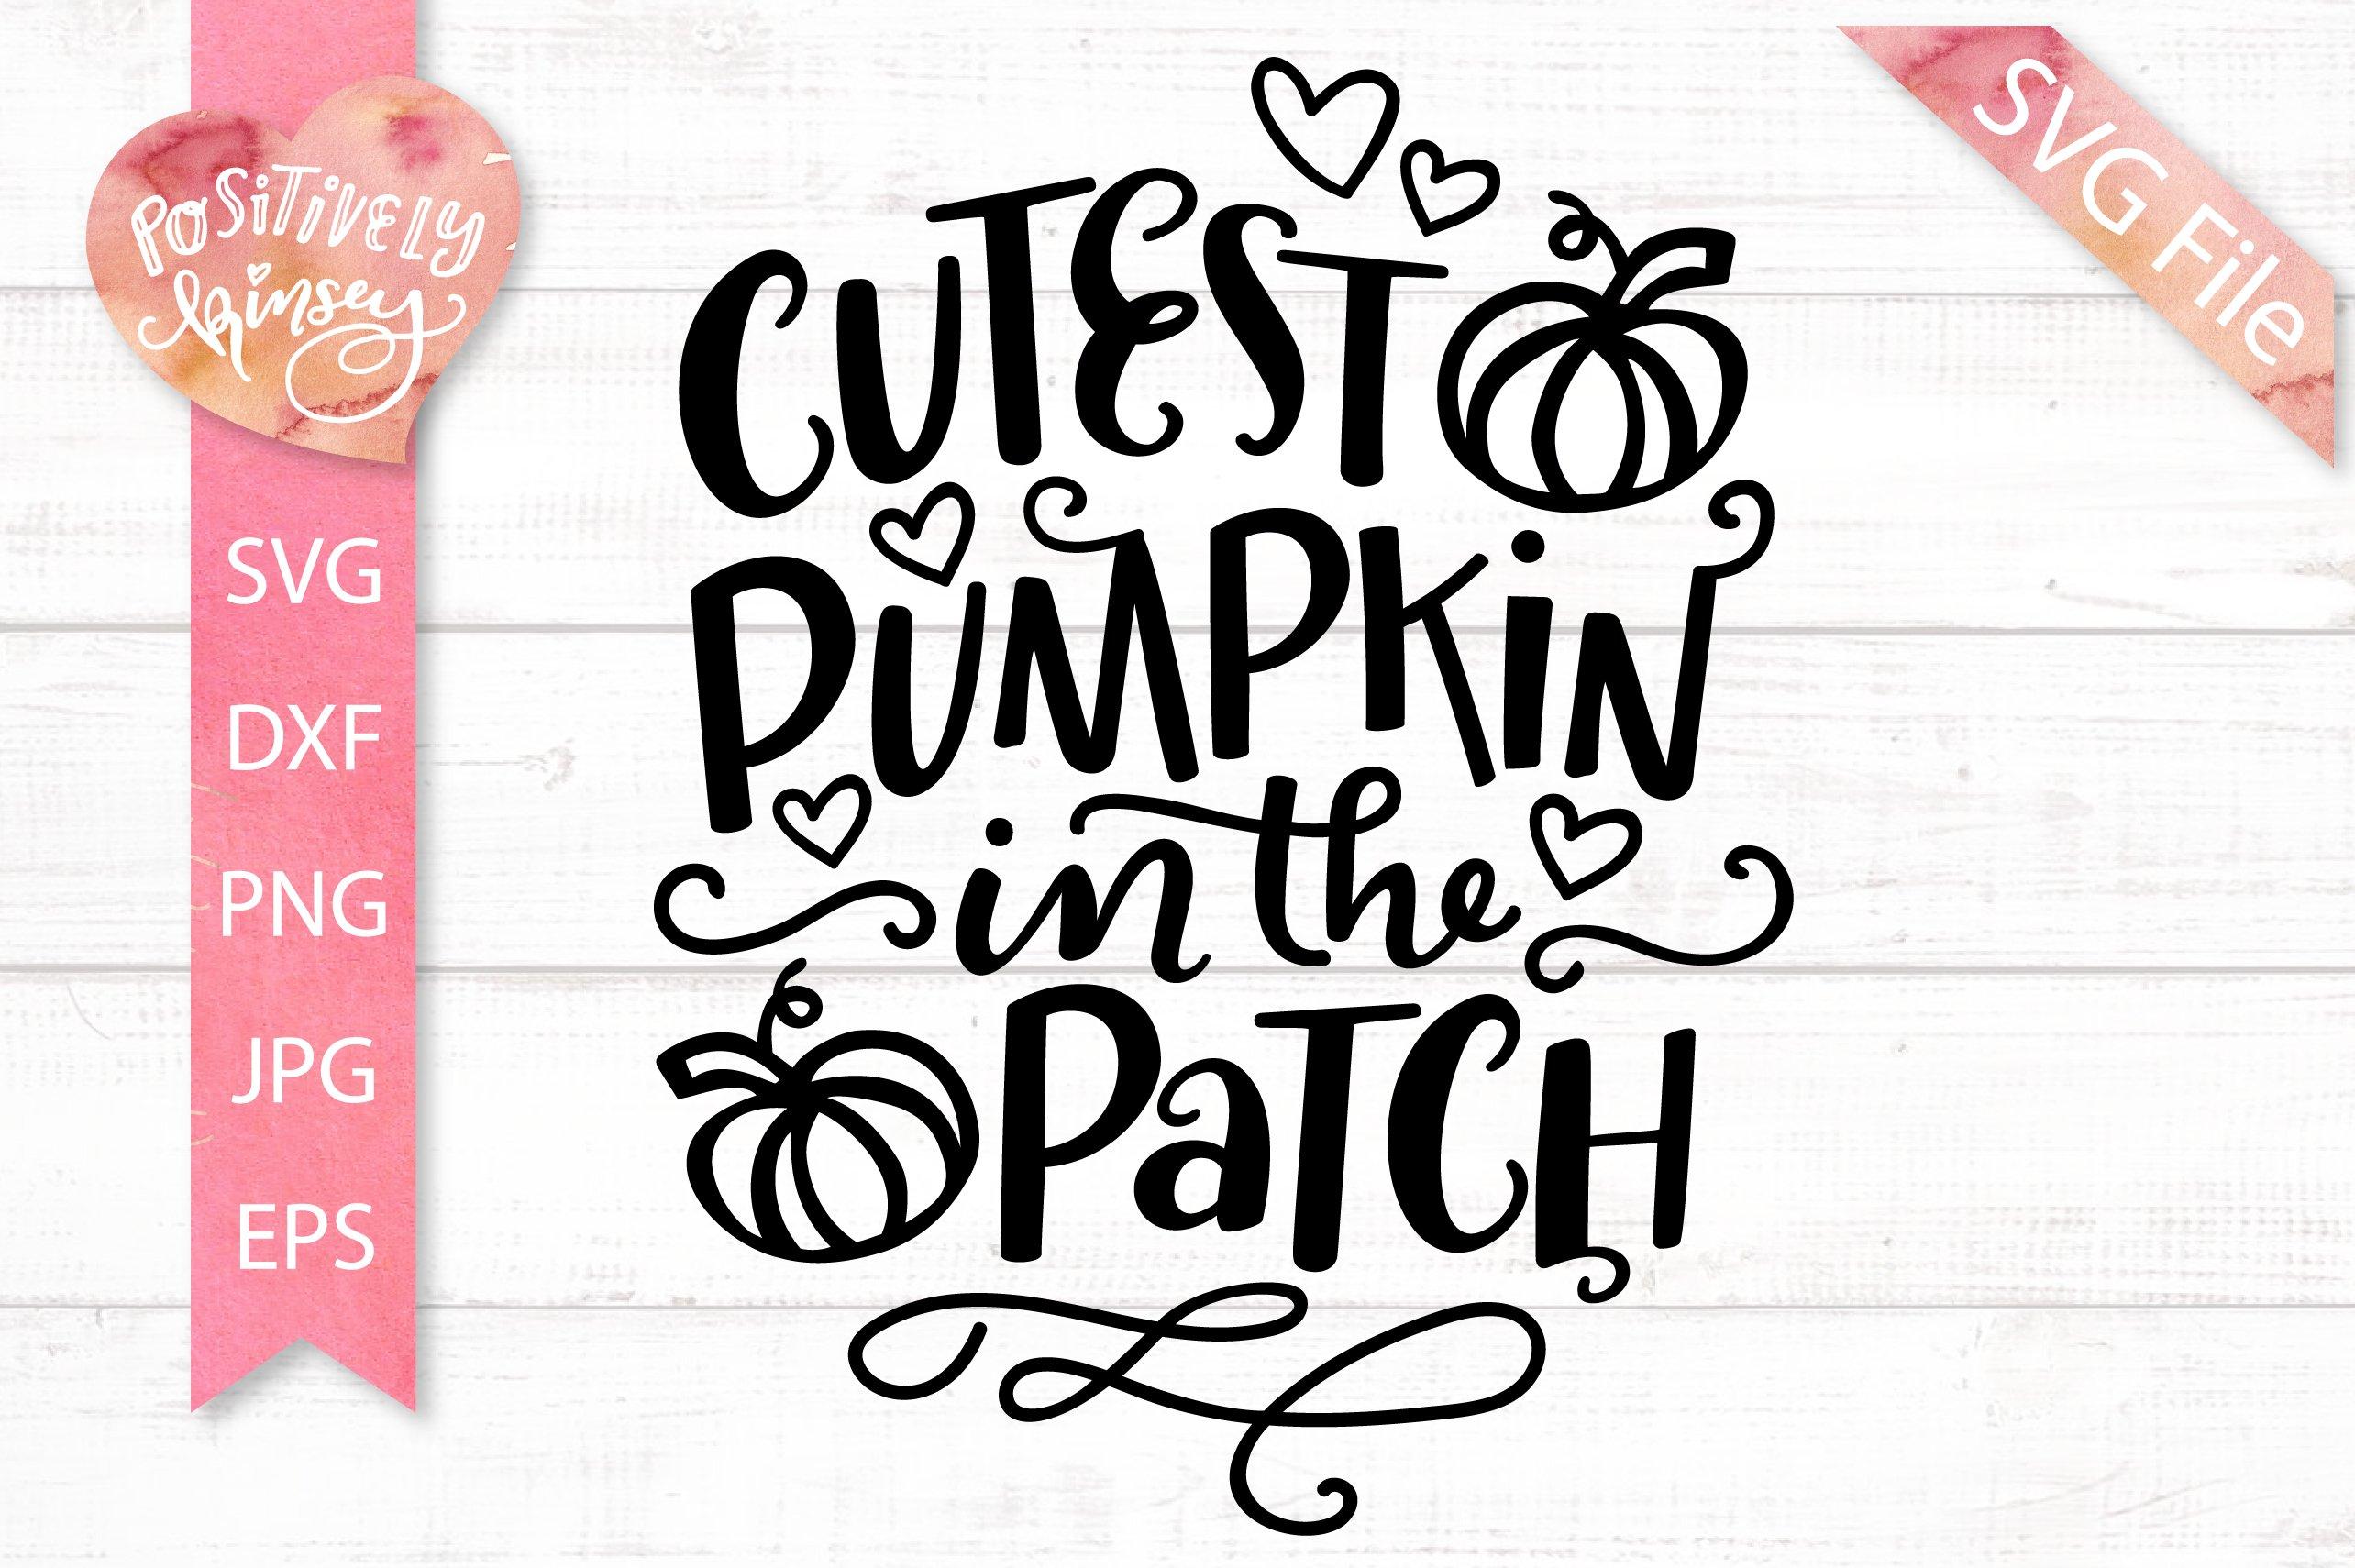 Cutest Pumpkin In The Patch Svg Dxf Png Eps Jpg Fall Kids 311798 Svgs Design Bundles